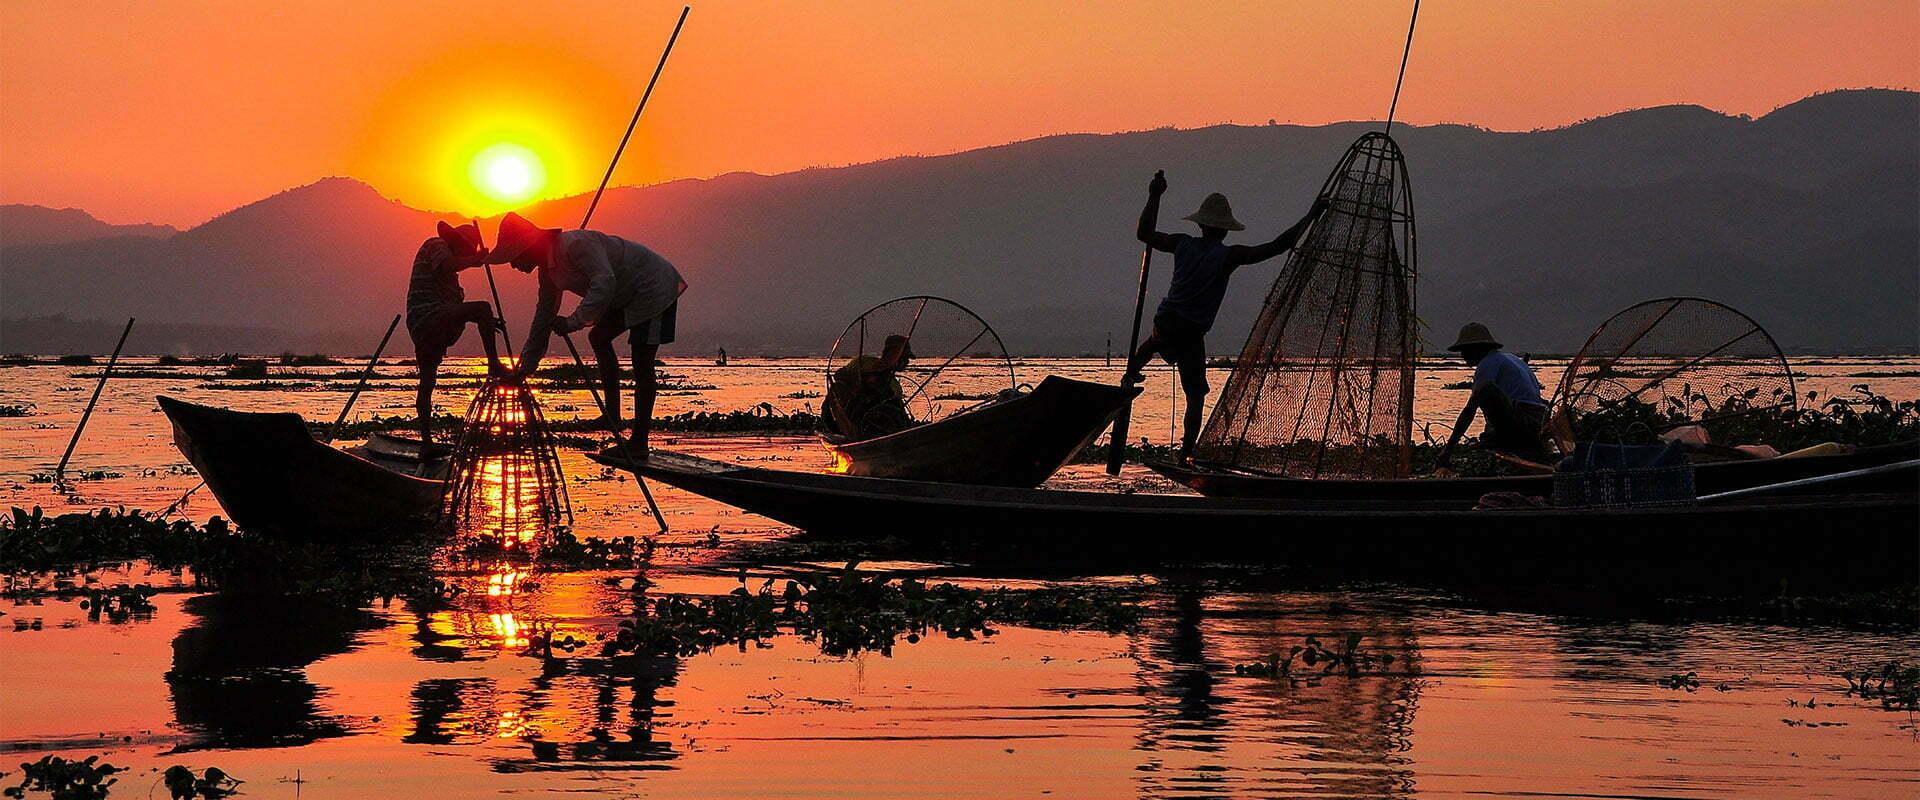 mandalay Birmanie pêche au couché du soleil